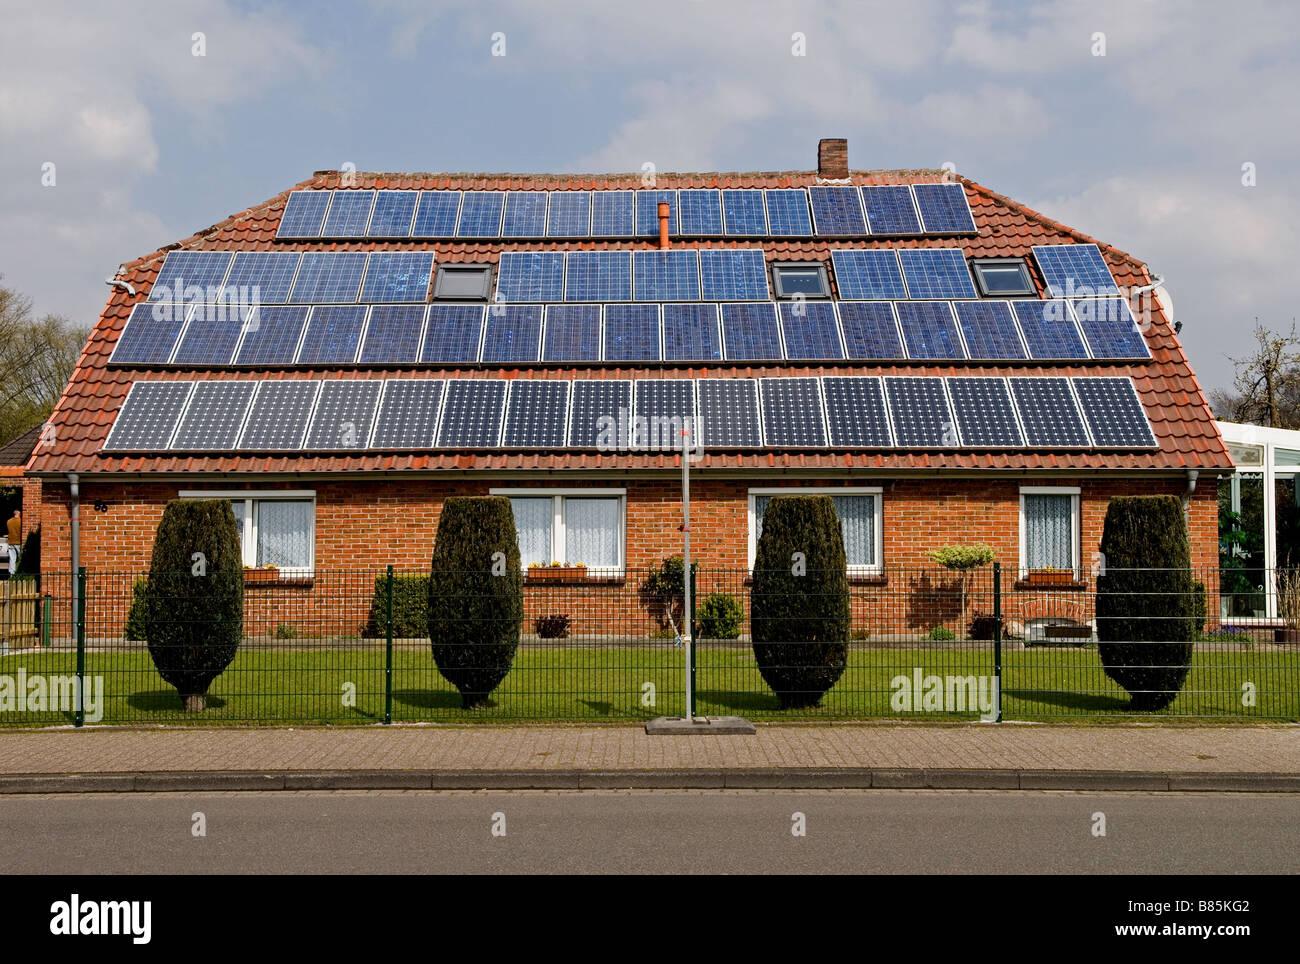 Casa de la energía solar, Oldenburg, Baja Sajonia, Alemania. Imagen De Stock